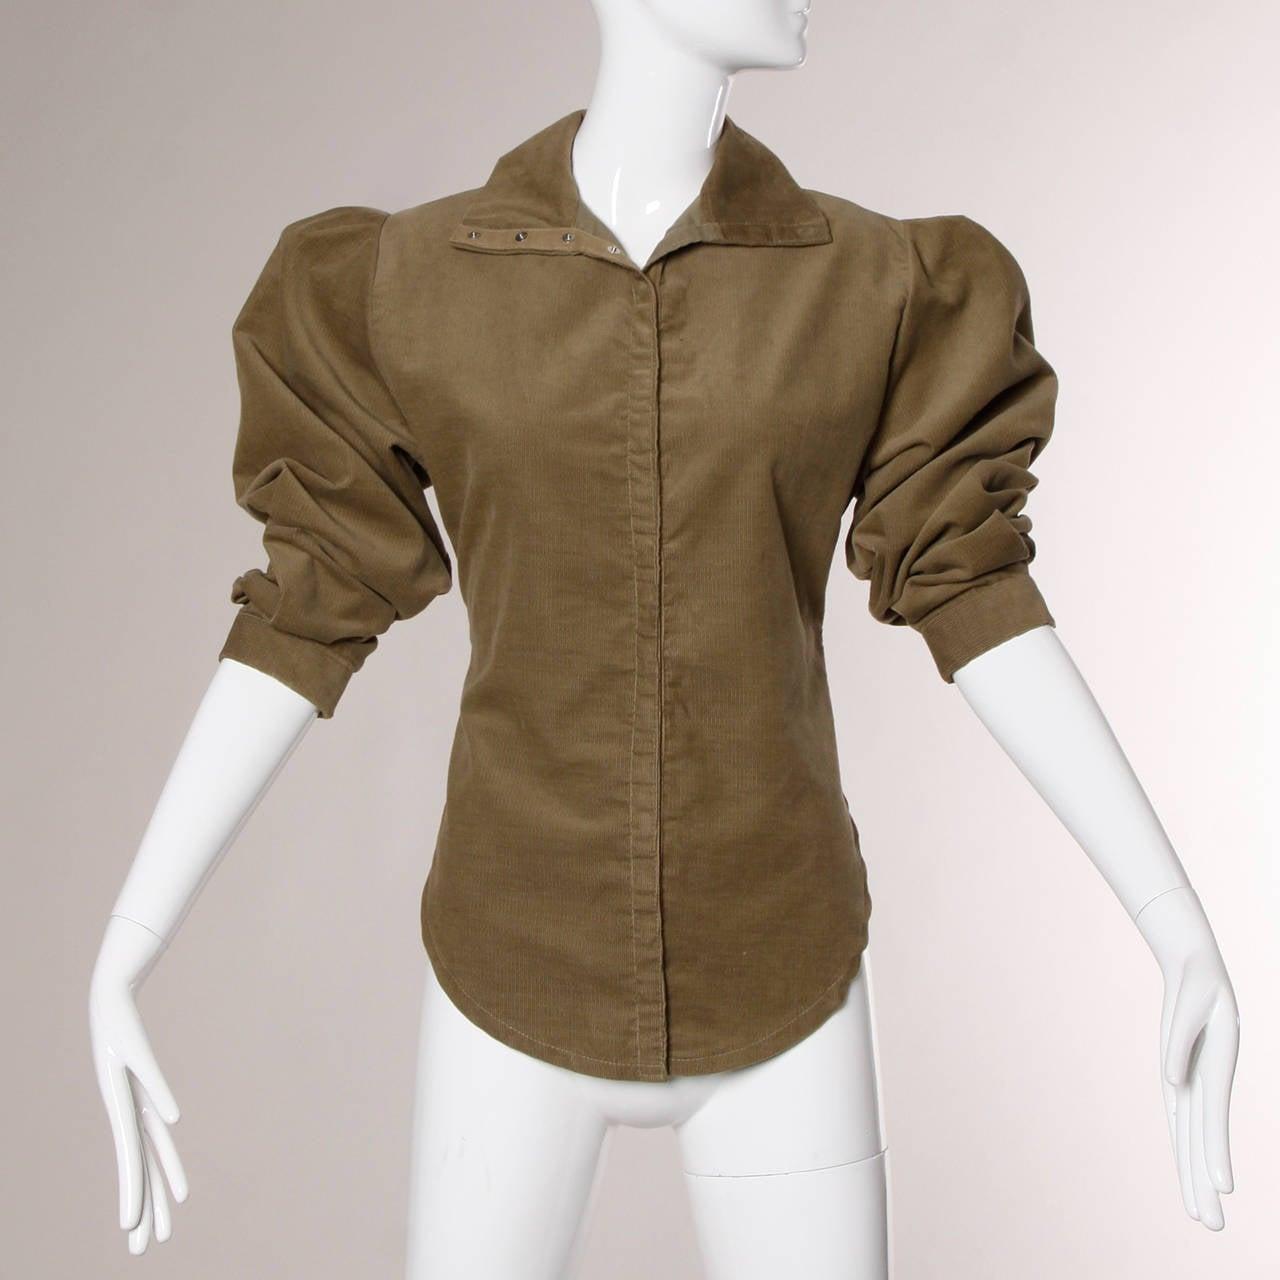 Women's Norma Kamali Vintage Avant Garde Top or Jacket For Sale